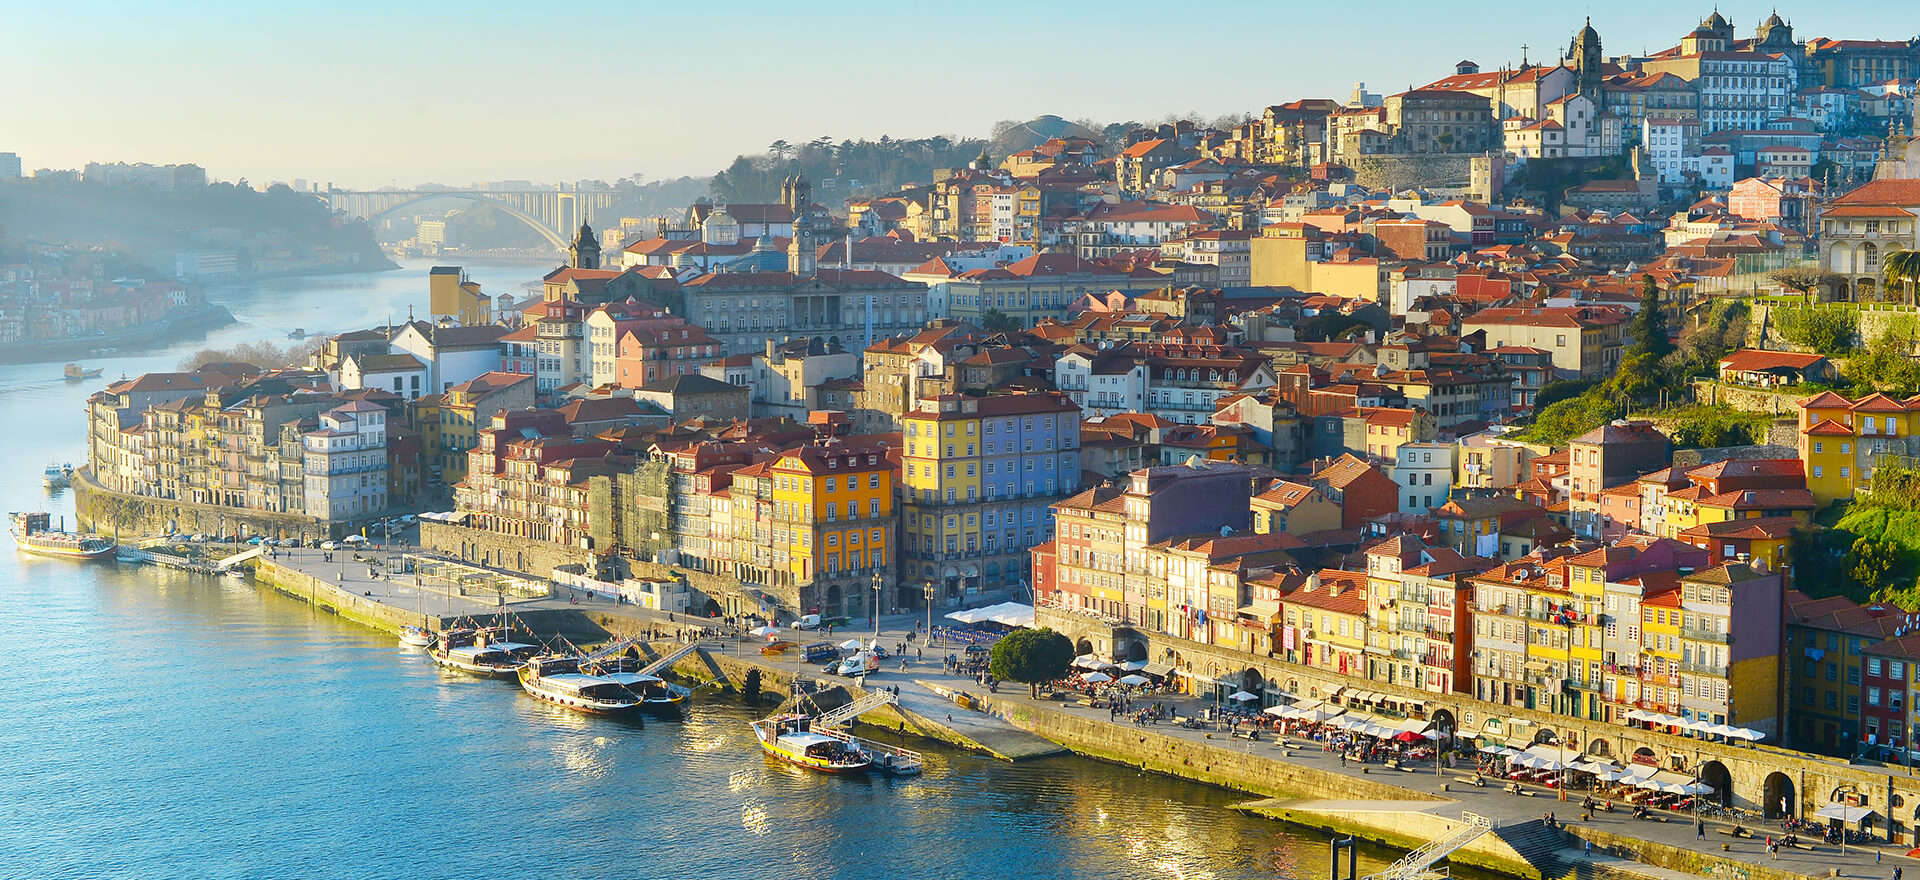 Port town of Porto along the Douro river in Portugal